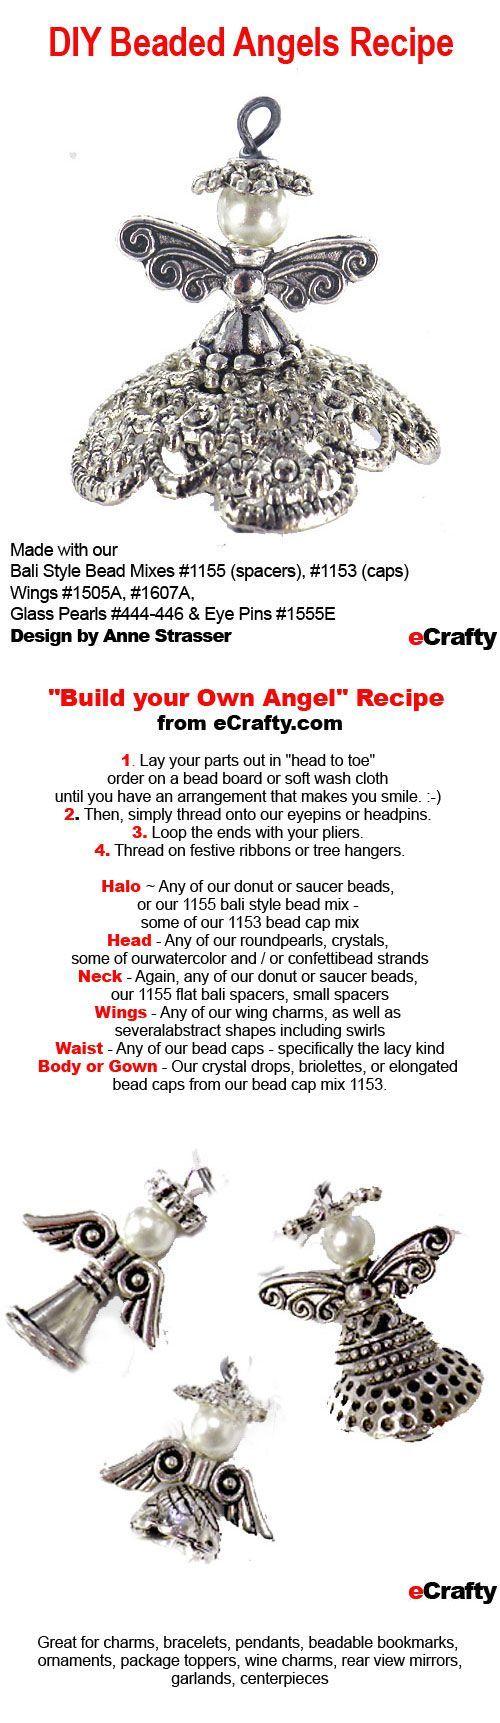 Make Ahead Gifts: DIY Beaded Angels Recipe from eCrafty.com | DIY Jewelry & Crafts from eCrafty.com